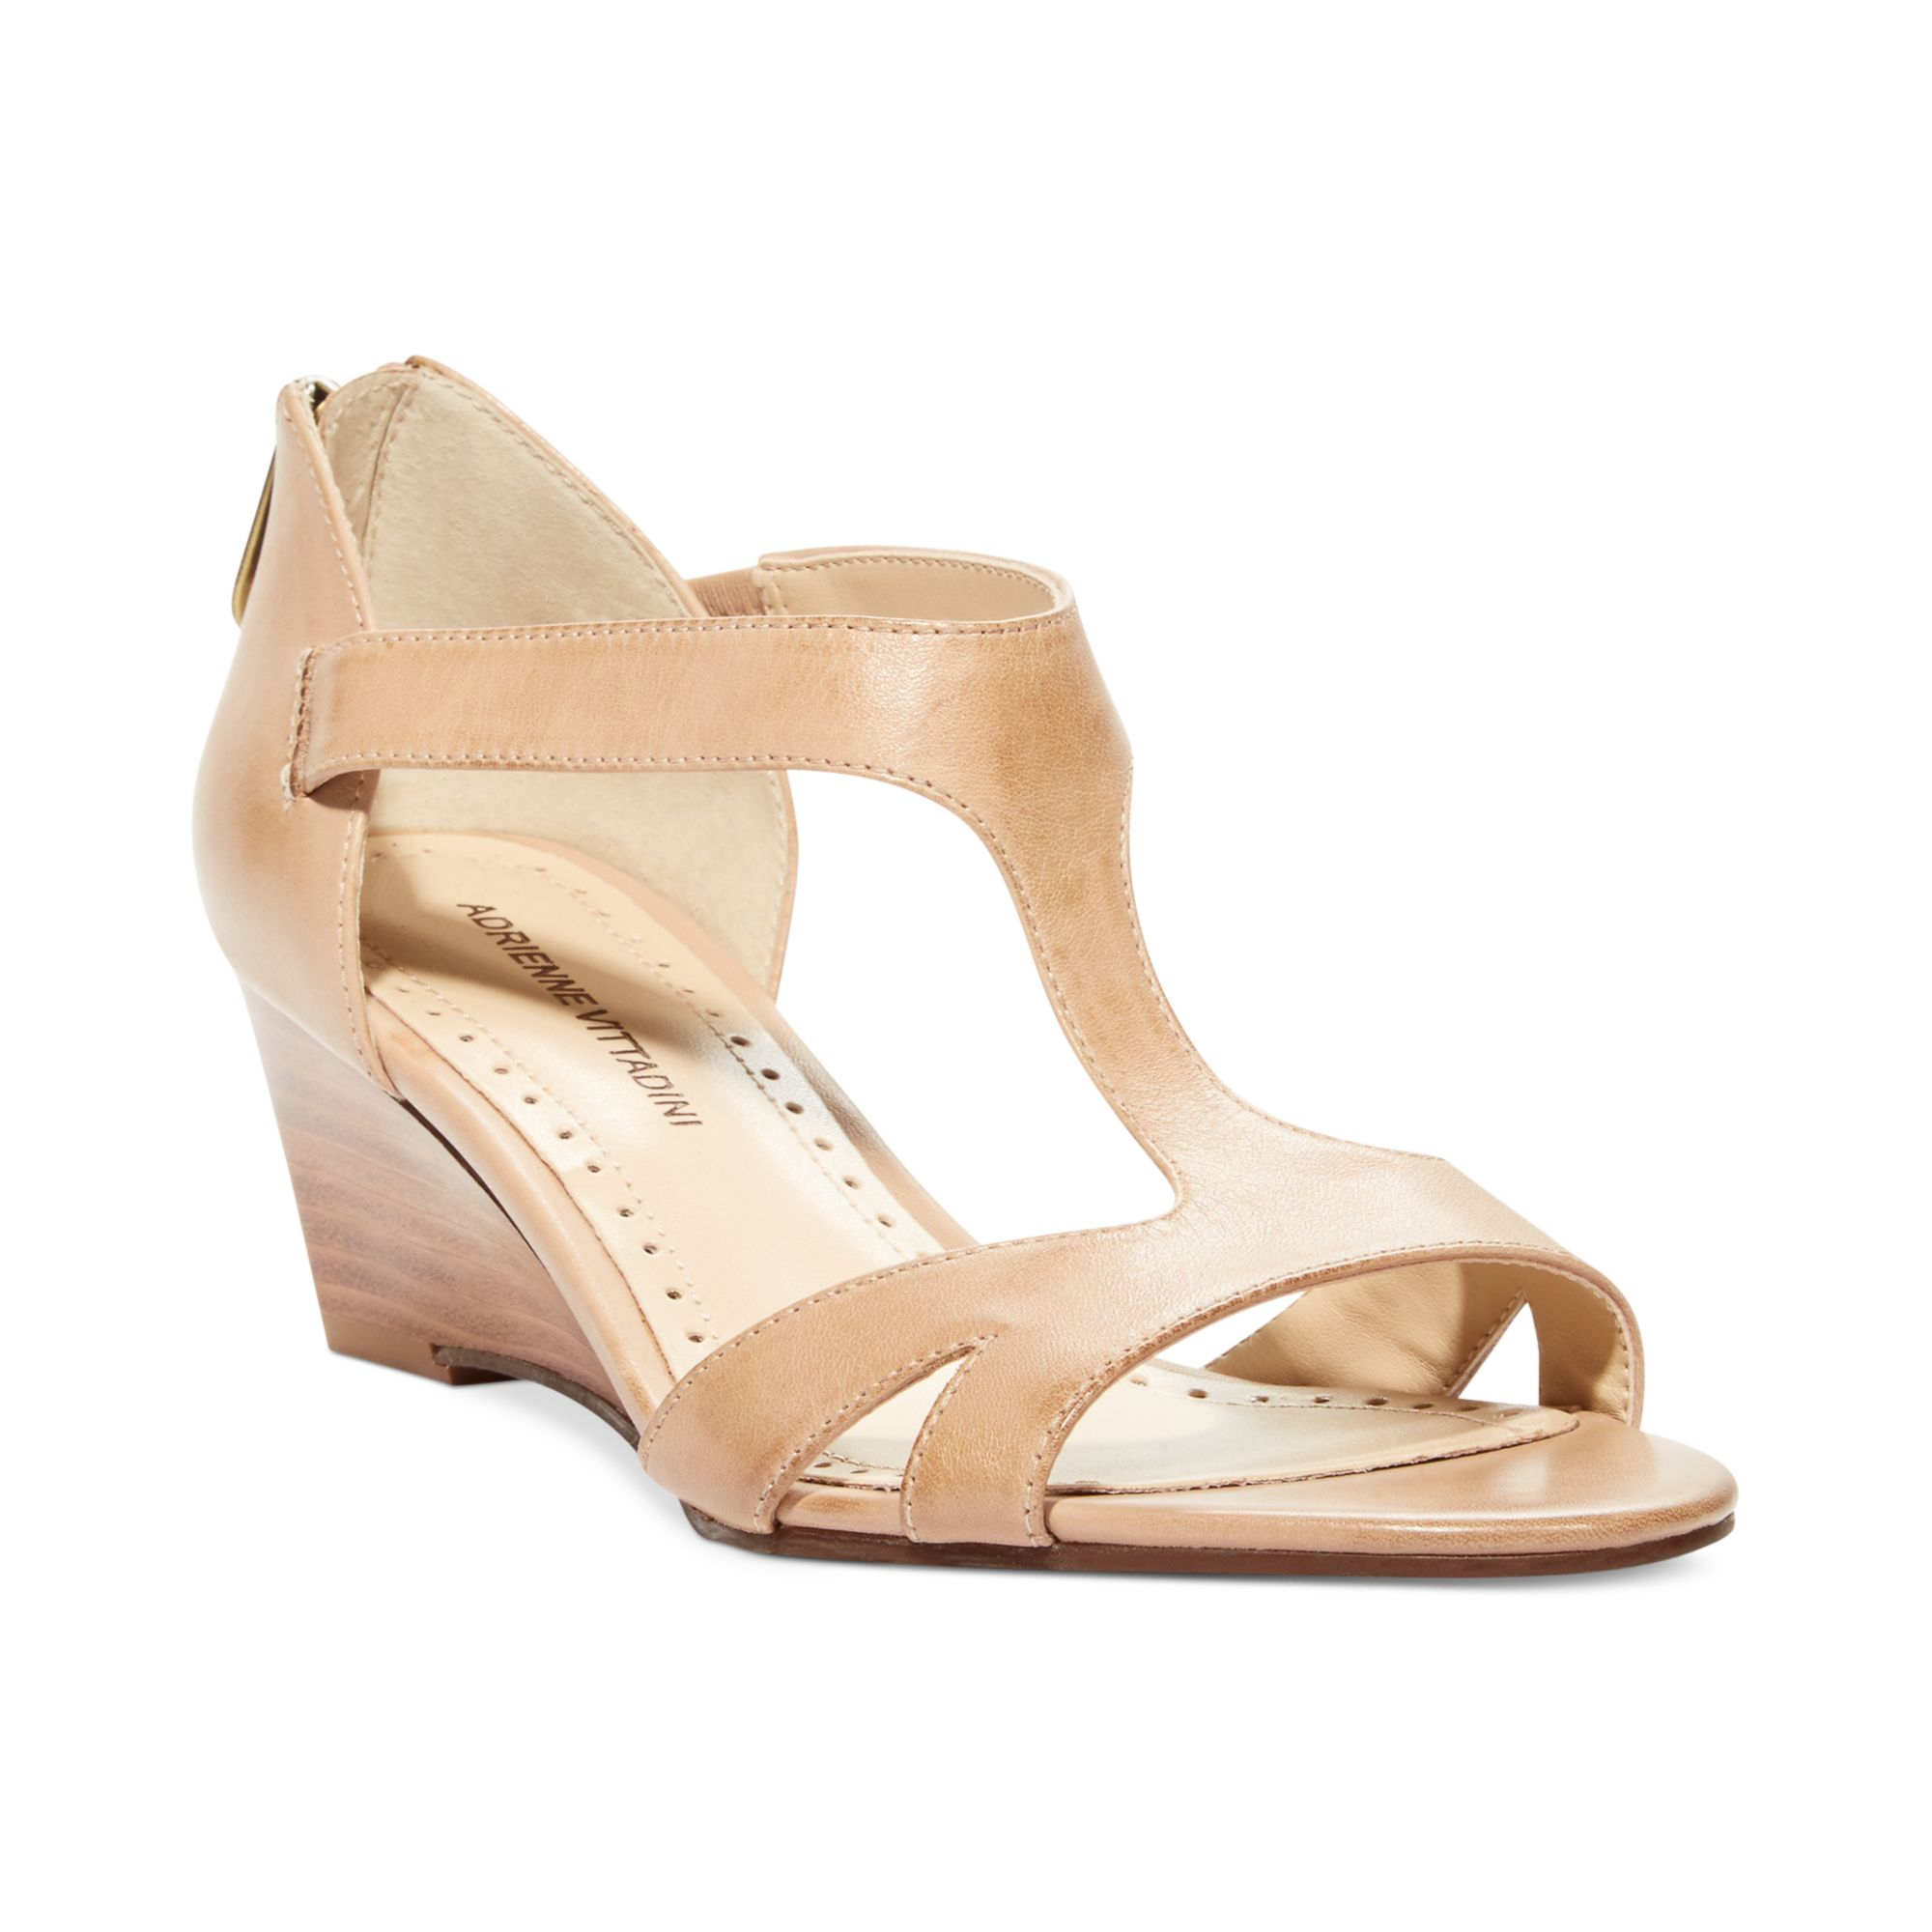 b946276a0ae Lyst - Adrienne Vittadini Cissy Mid Wedge Sandals in Natural